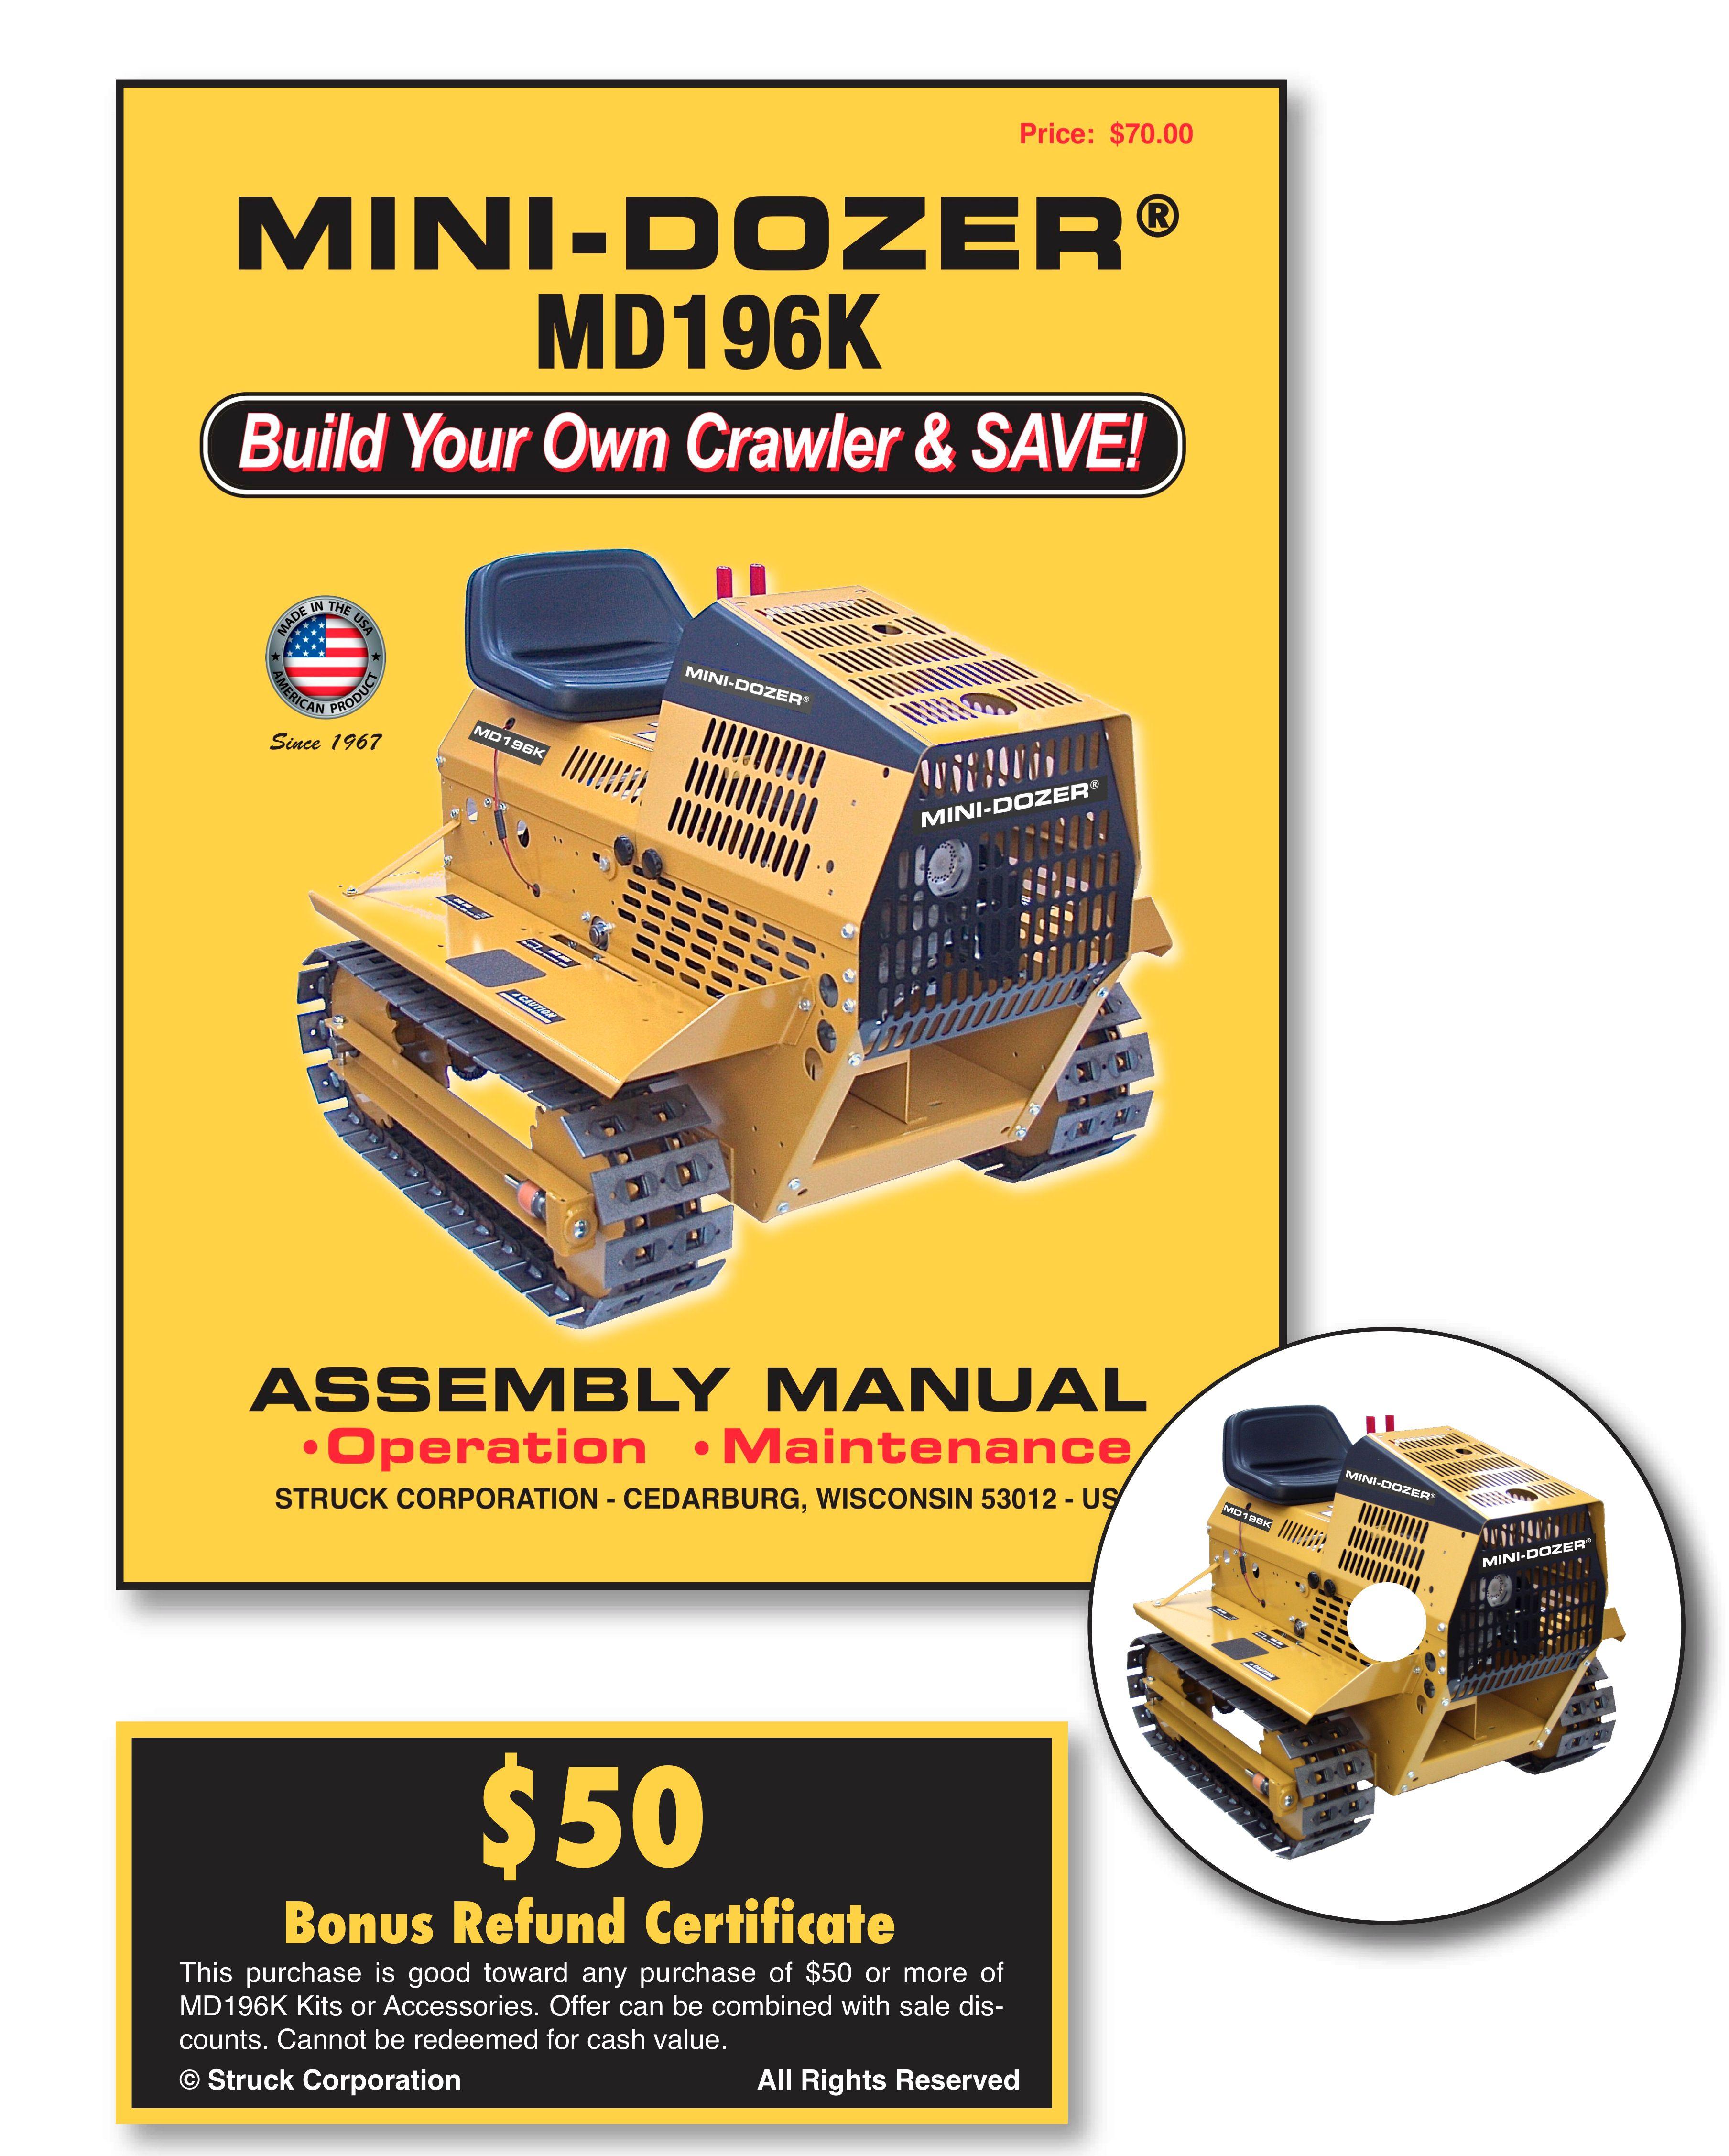 MINI-DOZER® MD196K - Struck Corp